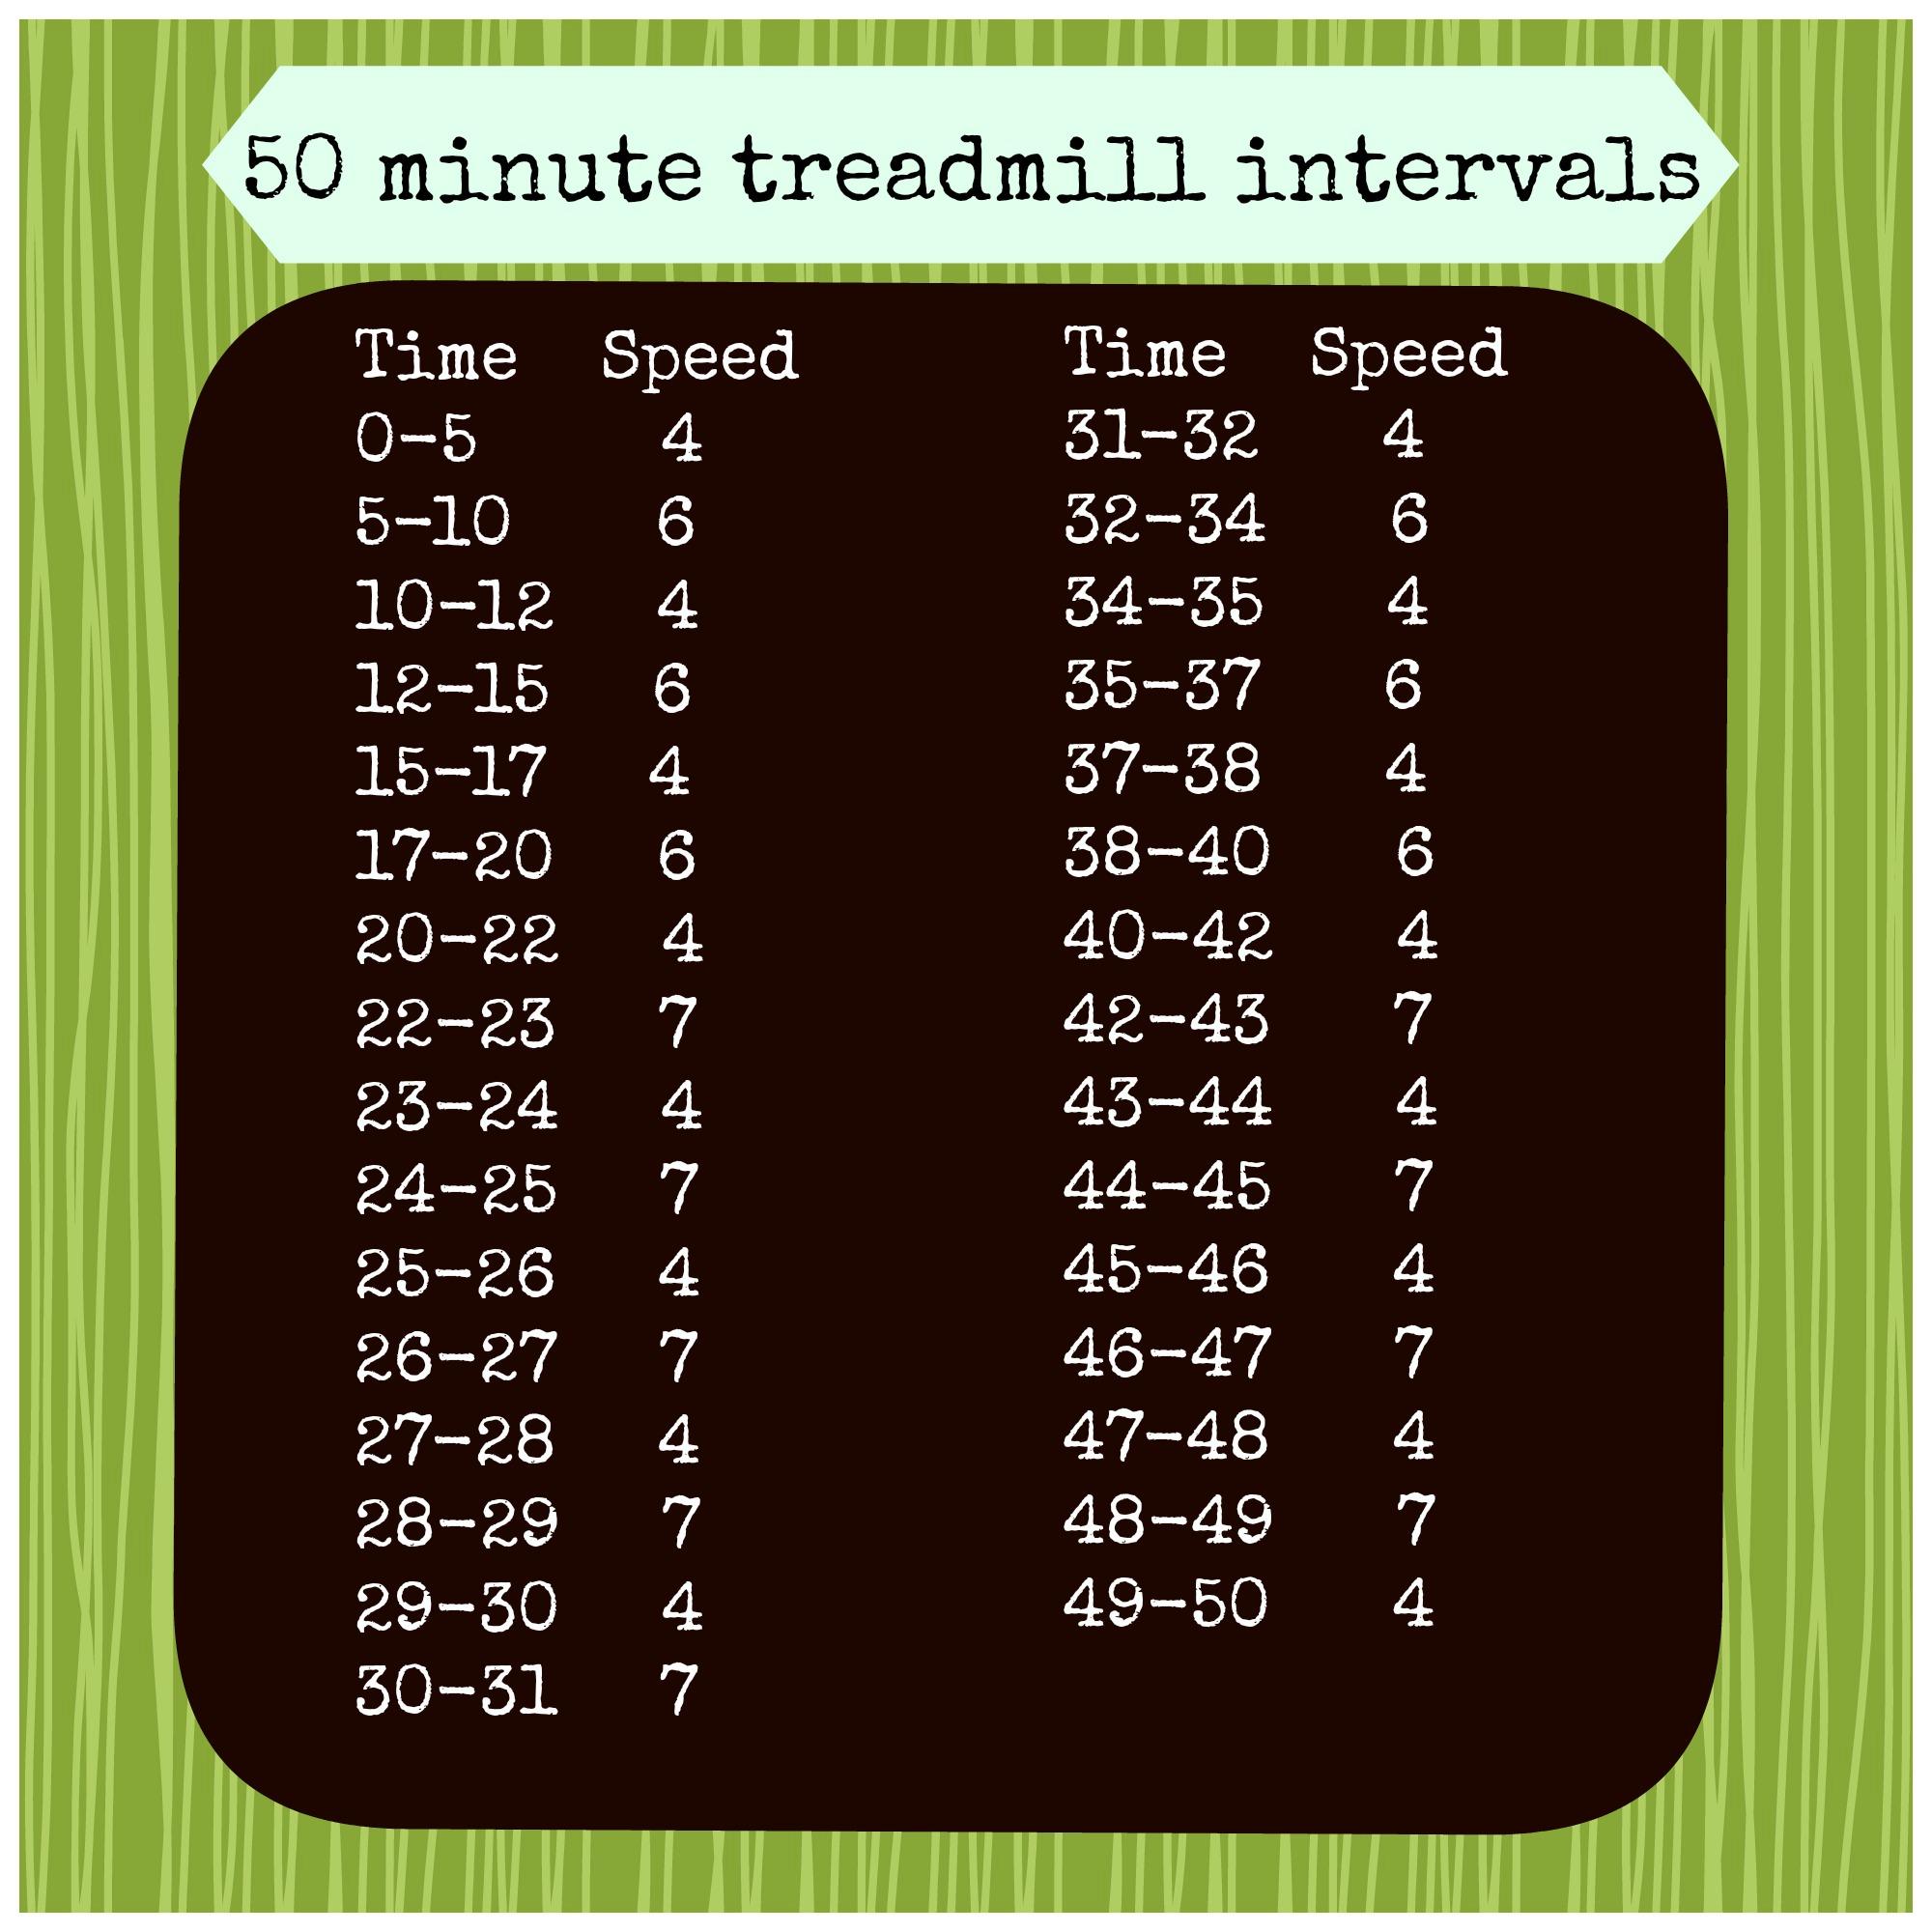 Treadmill Interval Workouts: Treadmill Interval Run